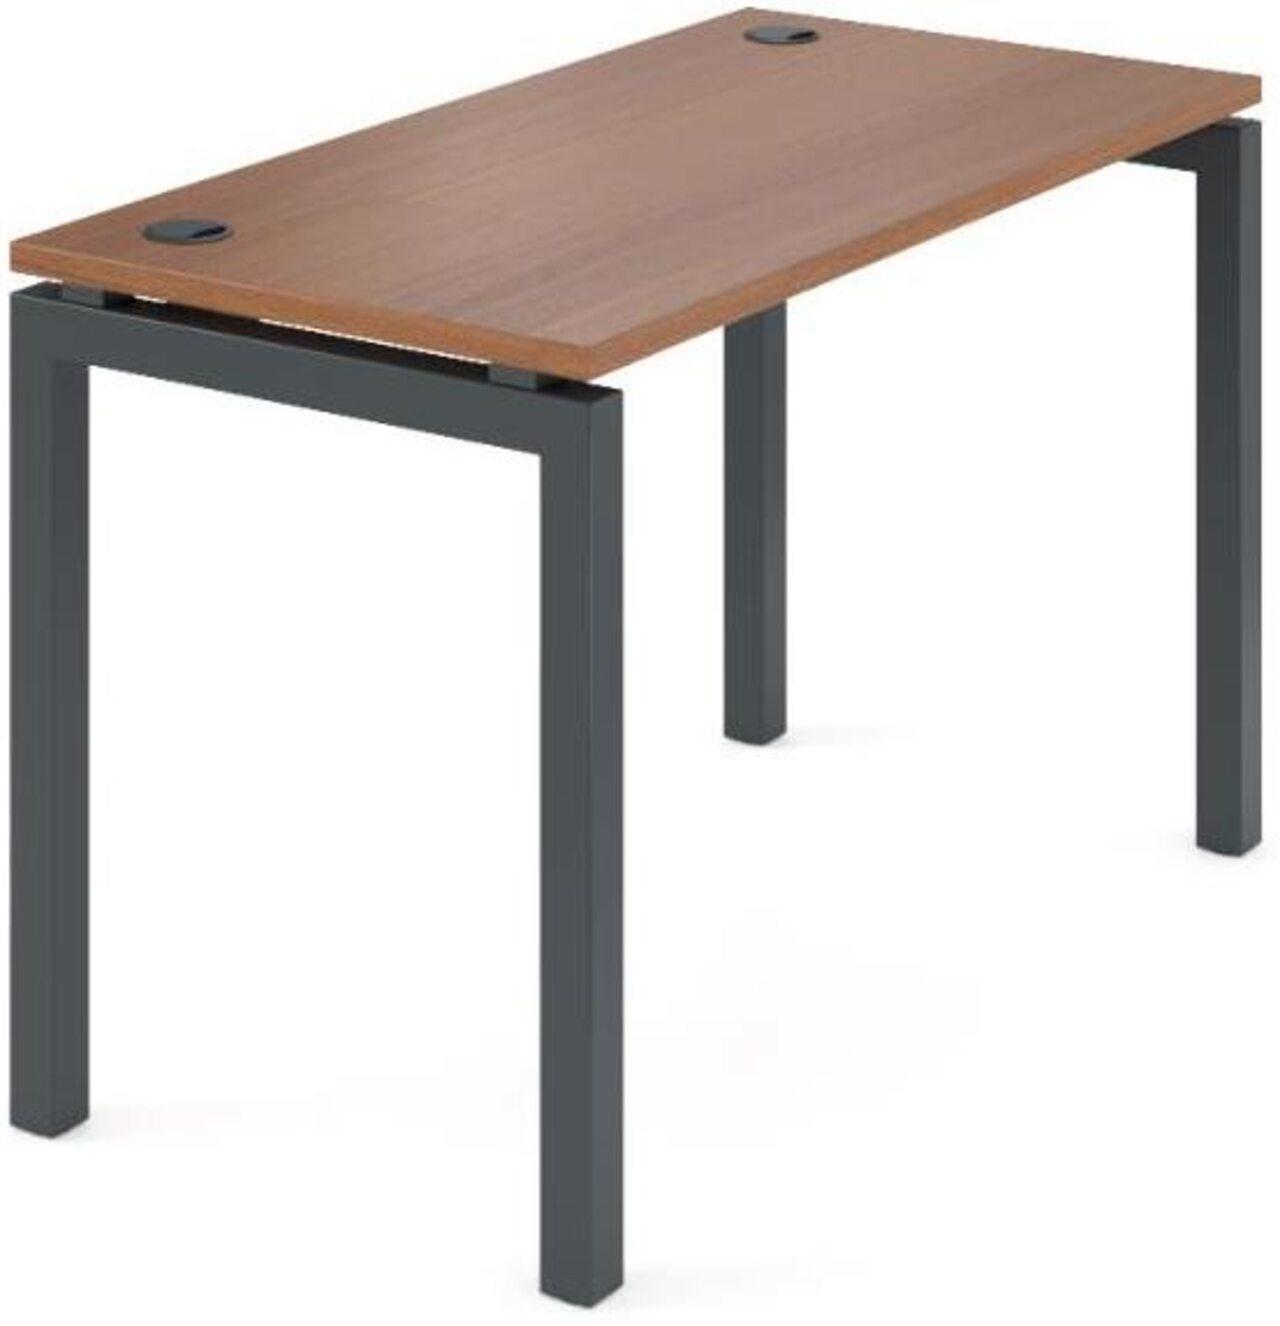 Стол на металлокаркасе  Арго 120x60x76 - фото 2